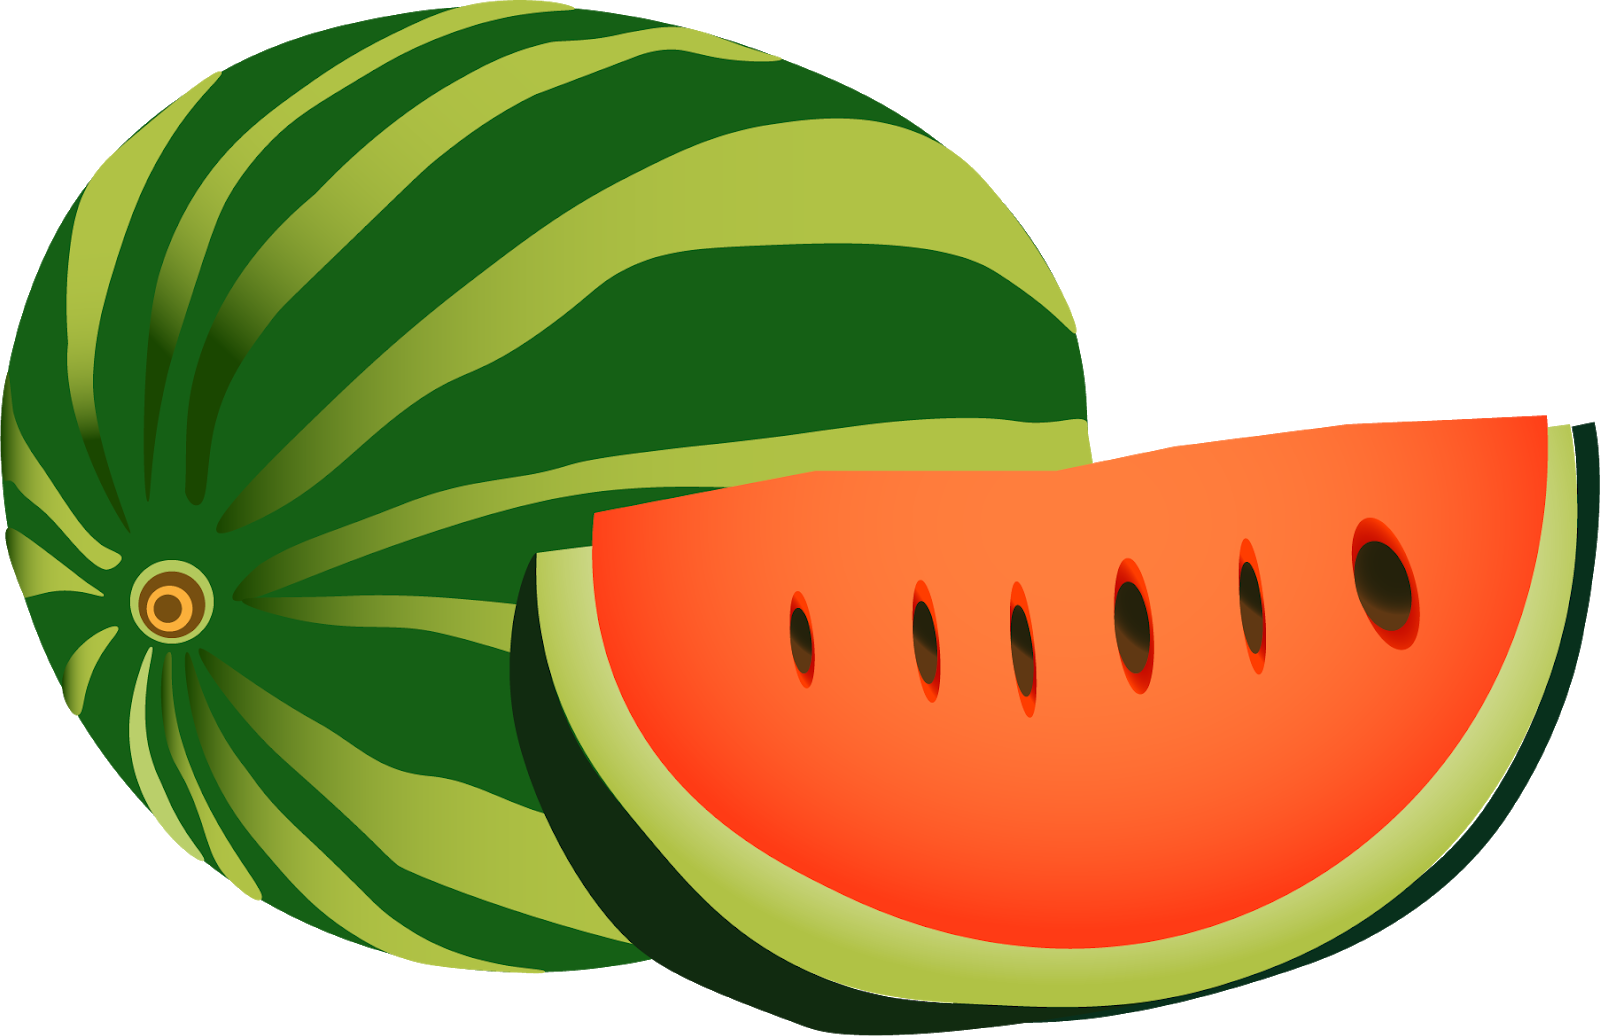 Watermelon clipart transparent background graphic transparent download Watermelon Clipart png Transparent Background | Graphics and ... graphic transparent download